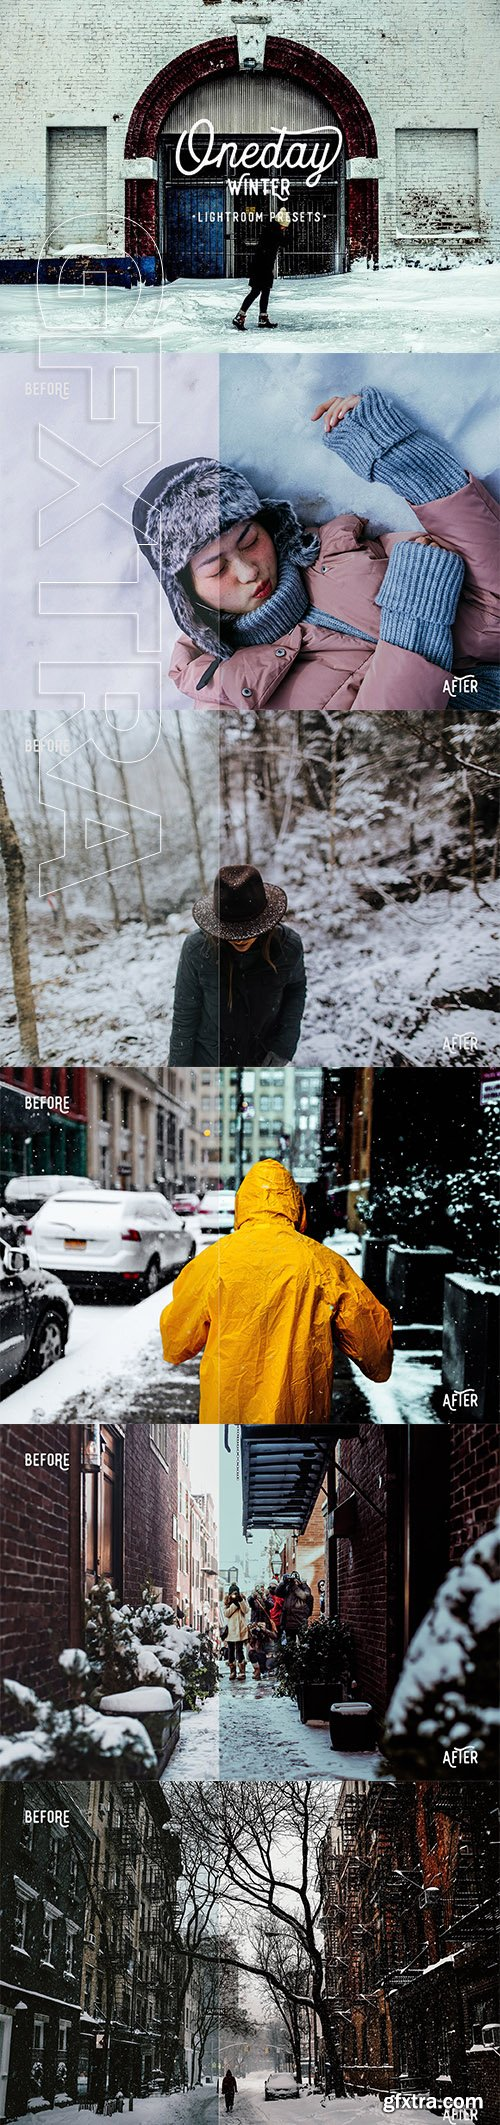 CreativeMarket - Oneday Winter Lightroom presets 2148764